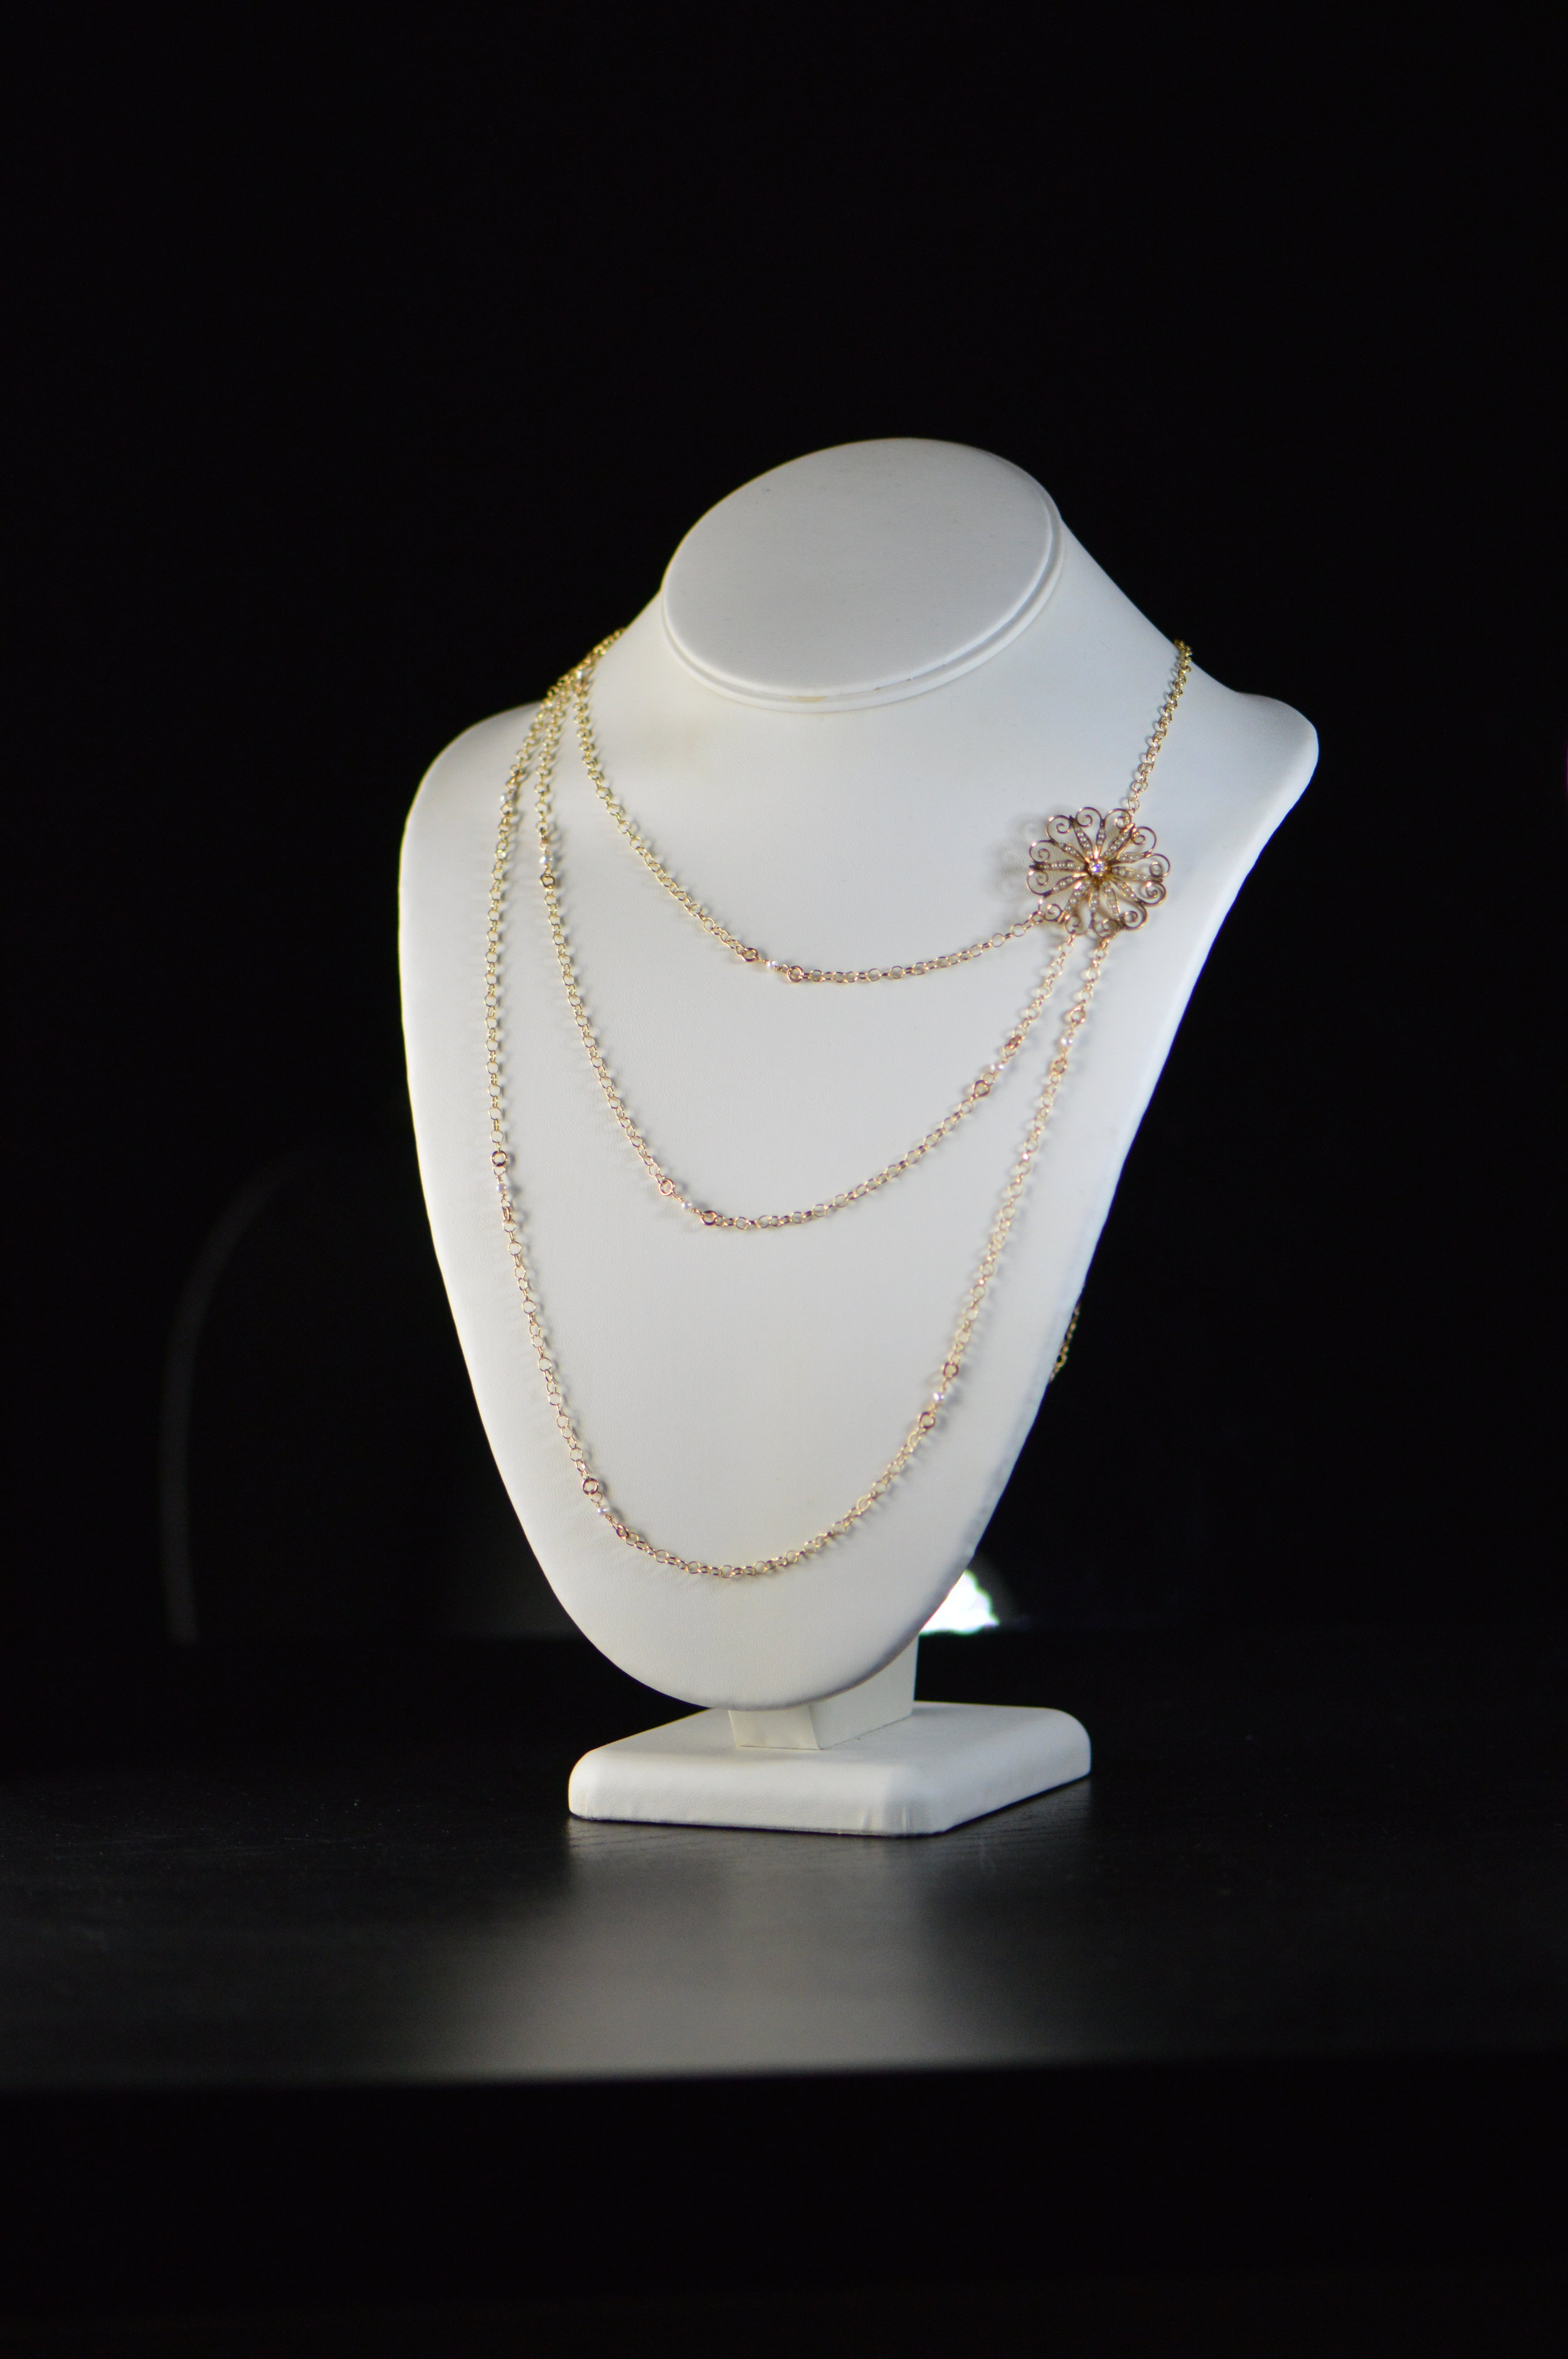 darvier-vintage-brooch-conversion-necklace.JPG